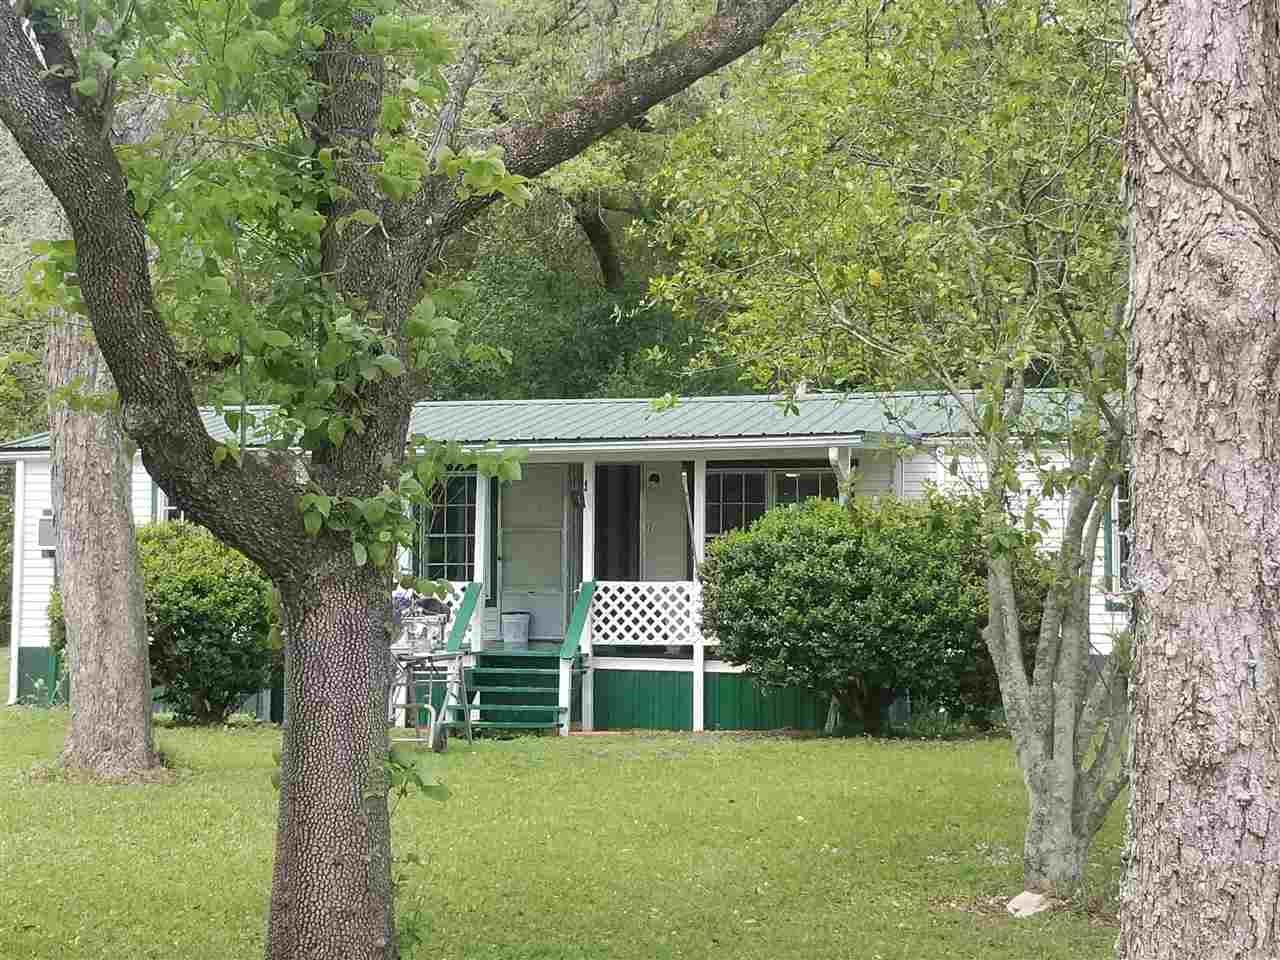 173 NW Jim Willis Road, Mayo, FL 32066 - MLS#: 330350